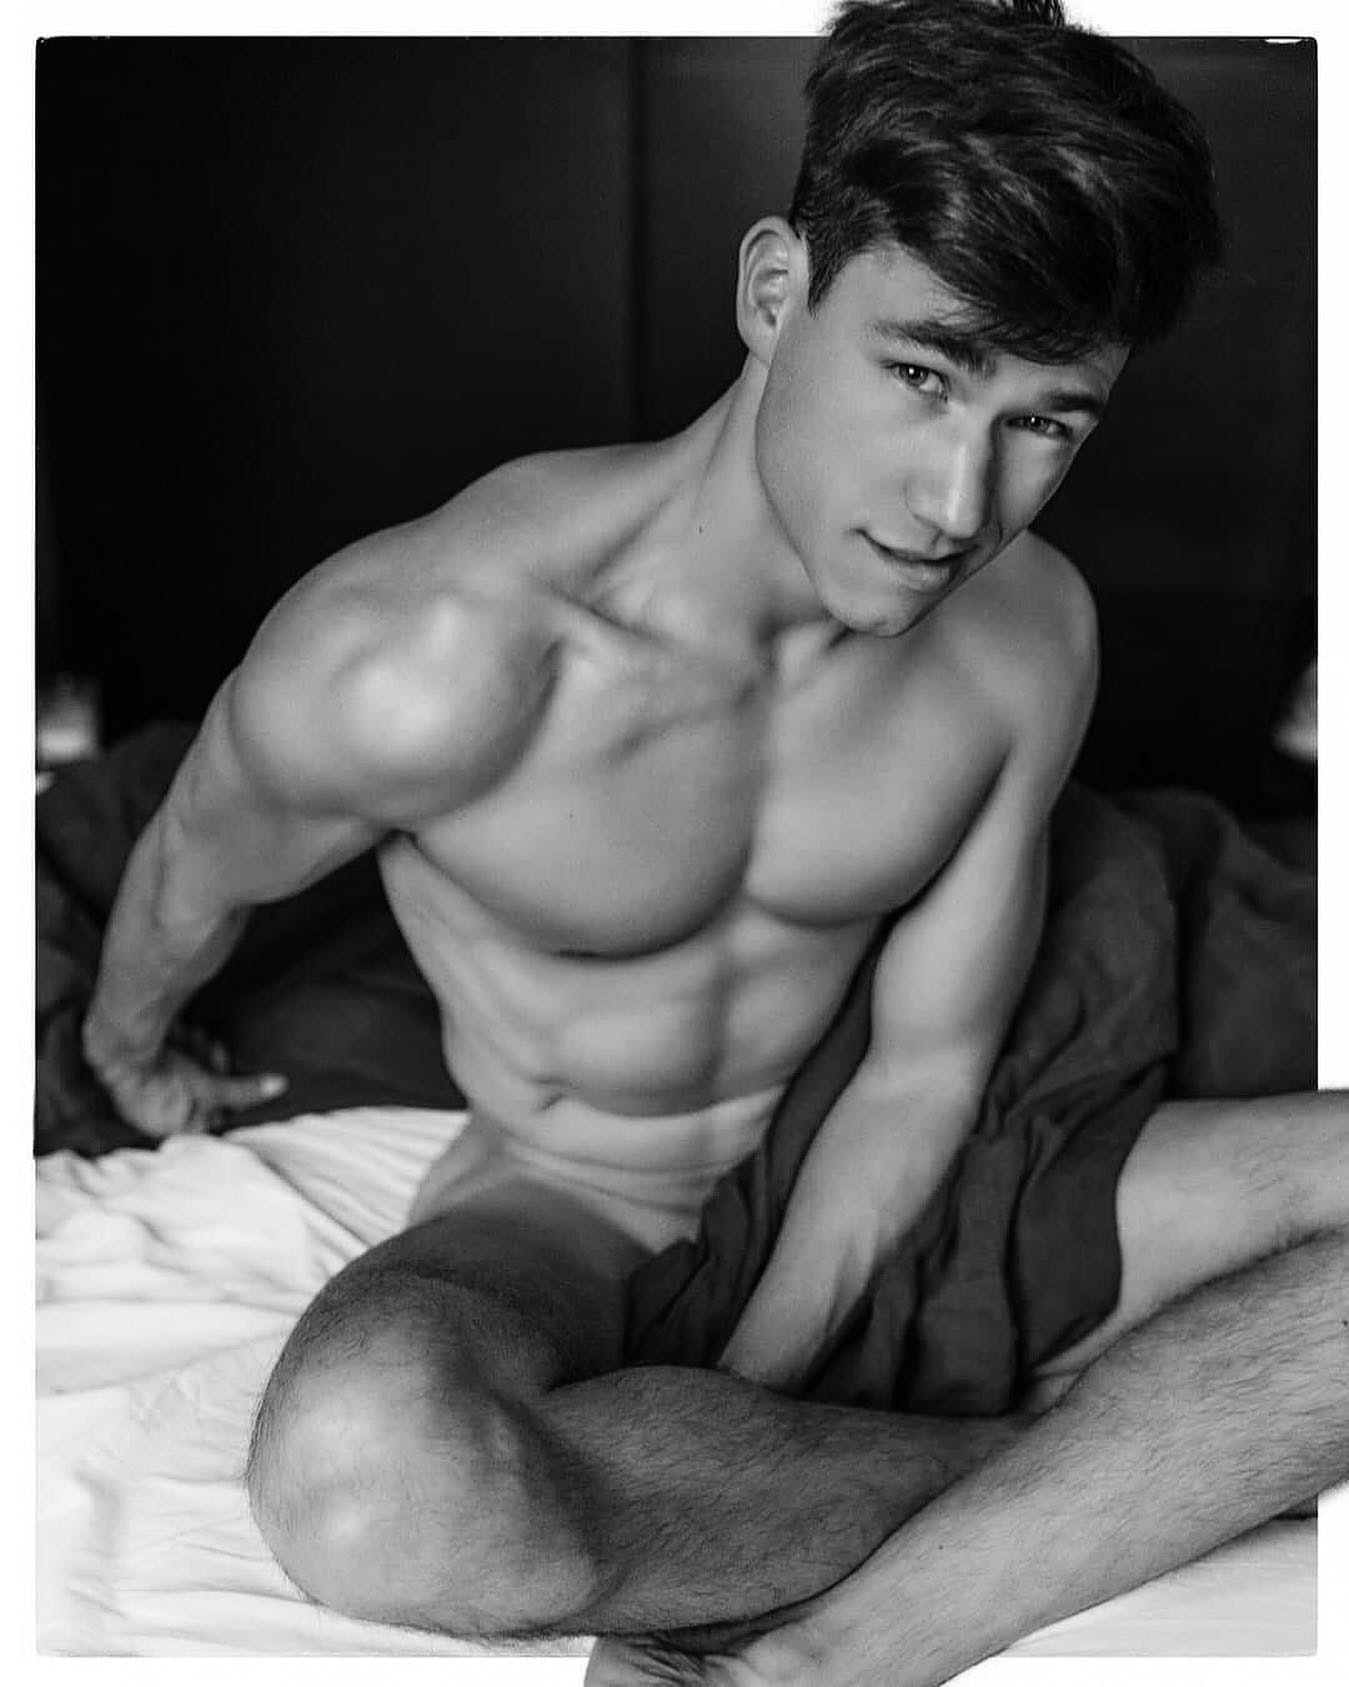 #men #blackandwhite #muscular #sixpack #abs #hotboys